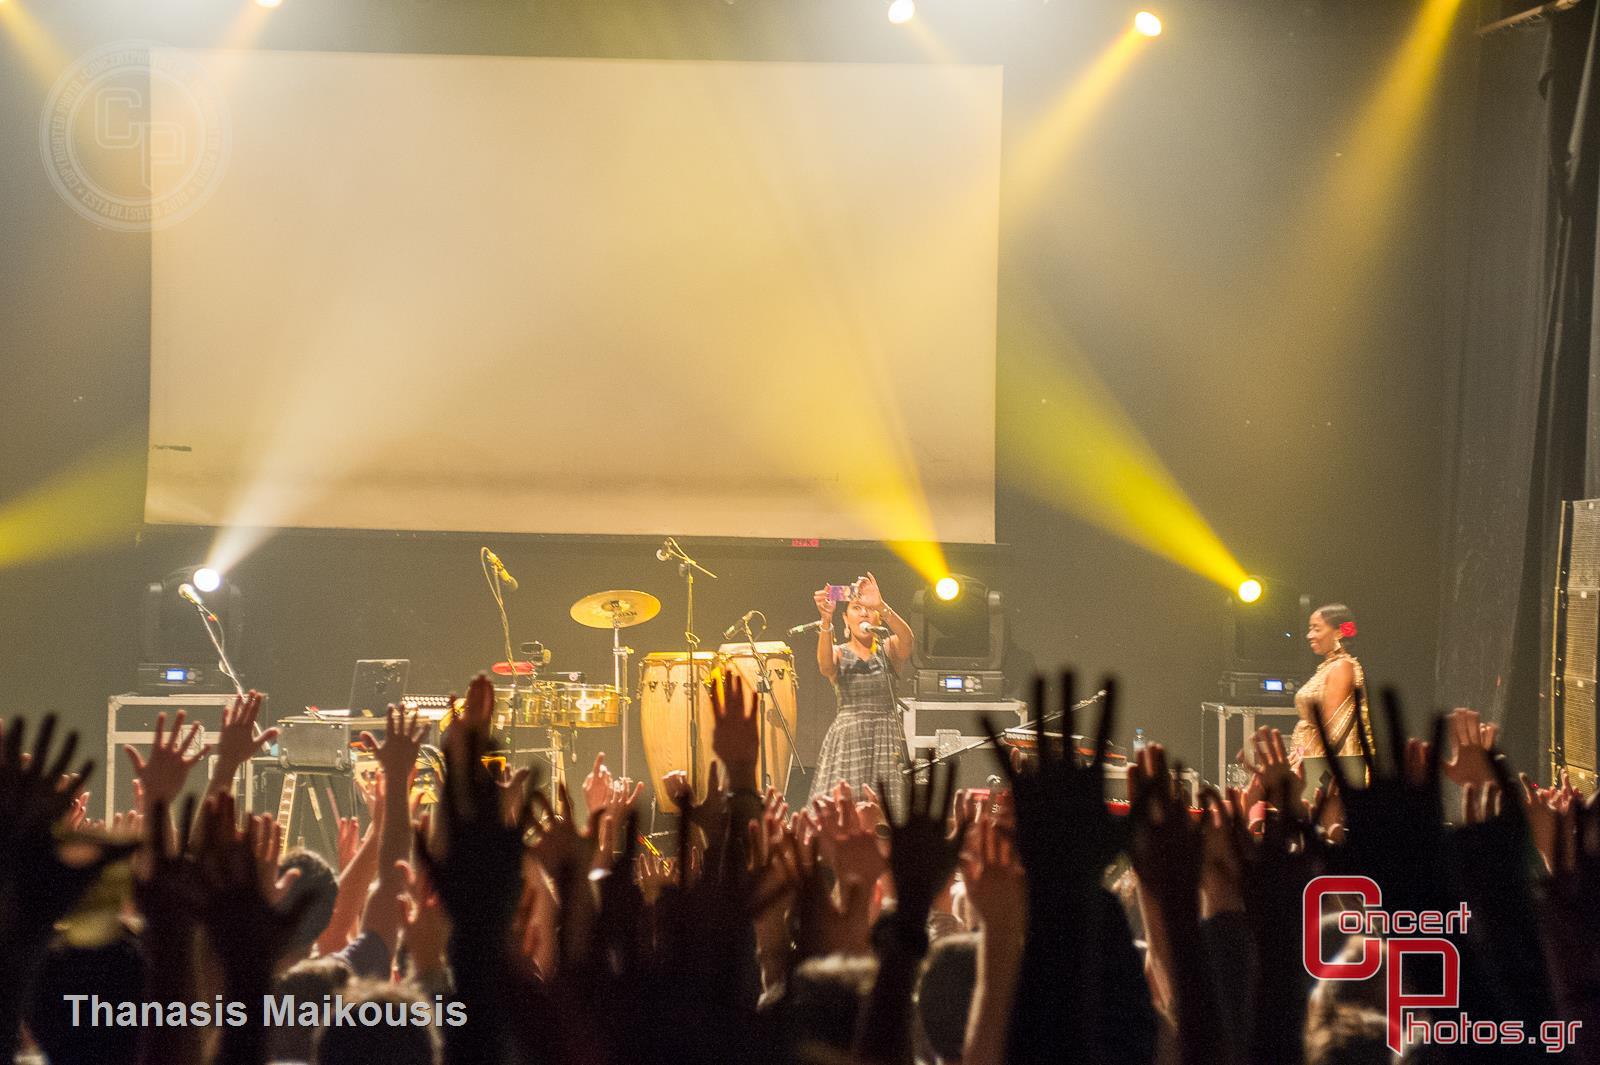 Quantic & Kill Emil -Quantic Kill Emil Gagarin photographer: Thanasis Maikousis - ConcertPhotos - 20141024_0016_57